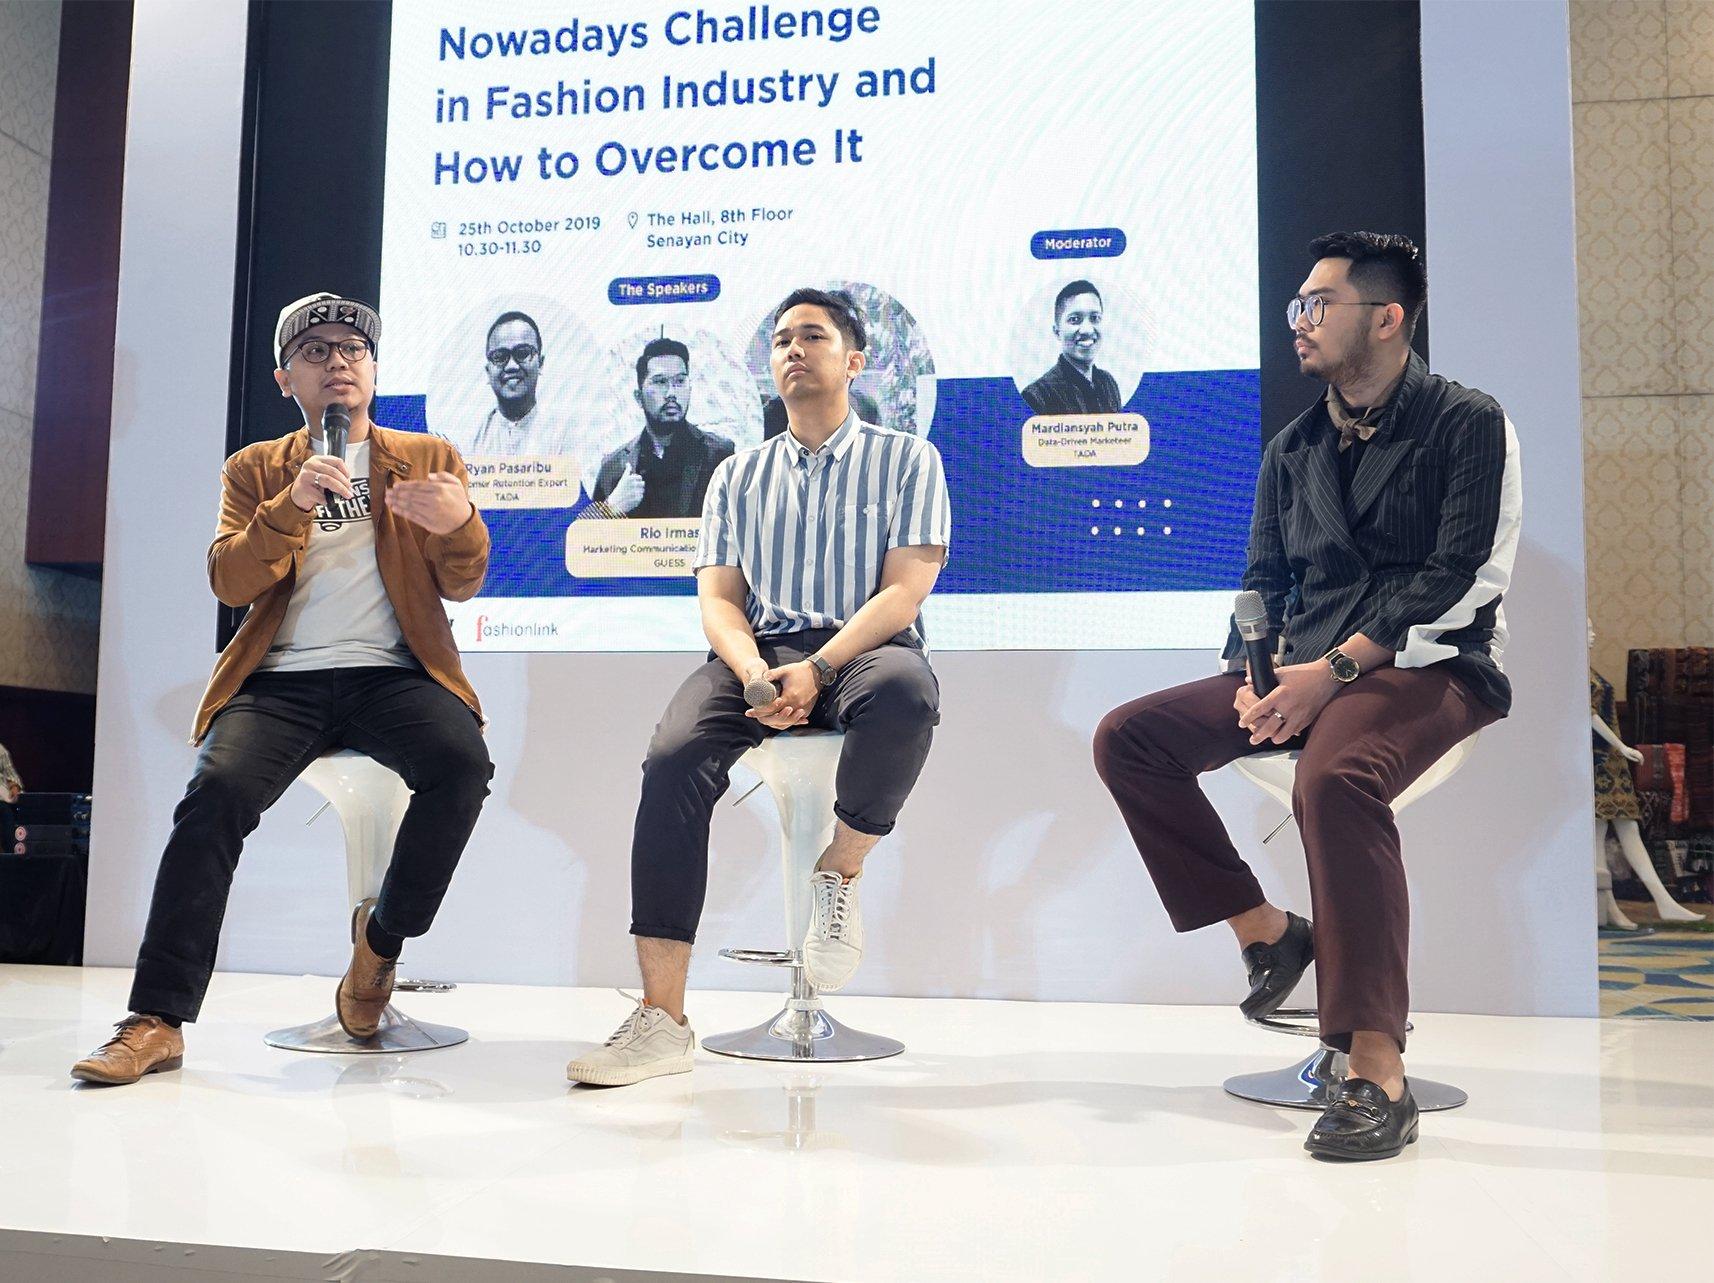 Customer Retention in Fashion Industry Talk